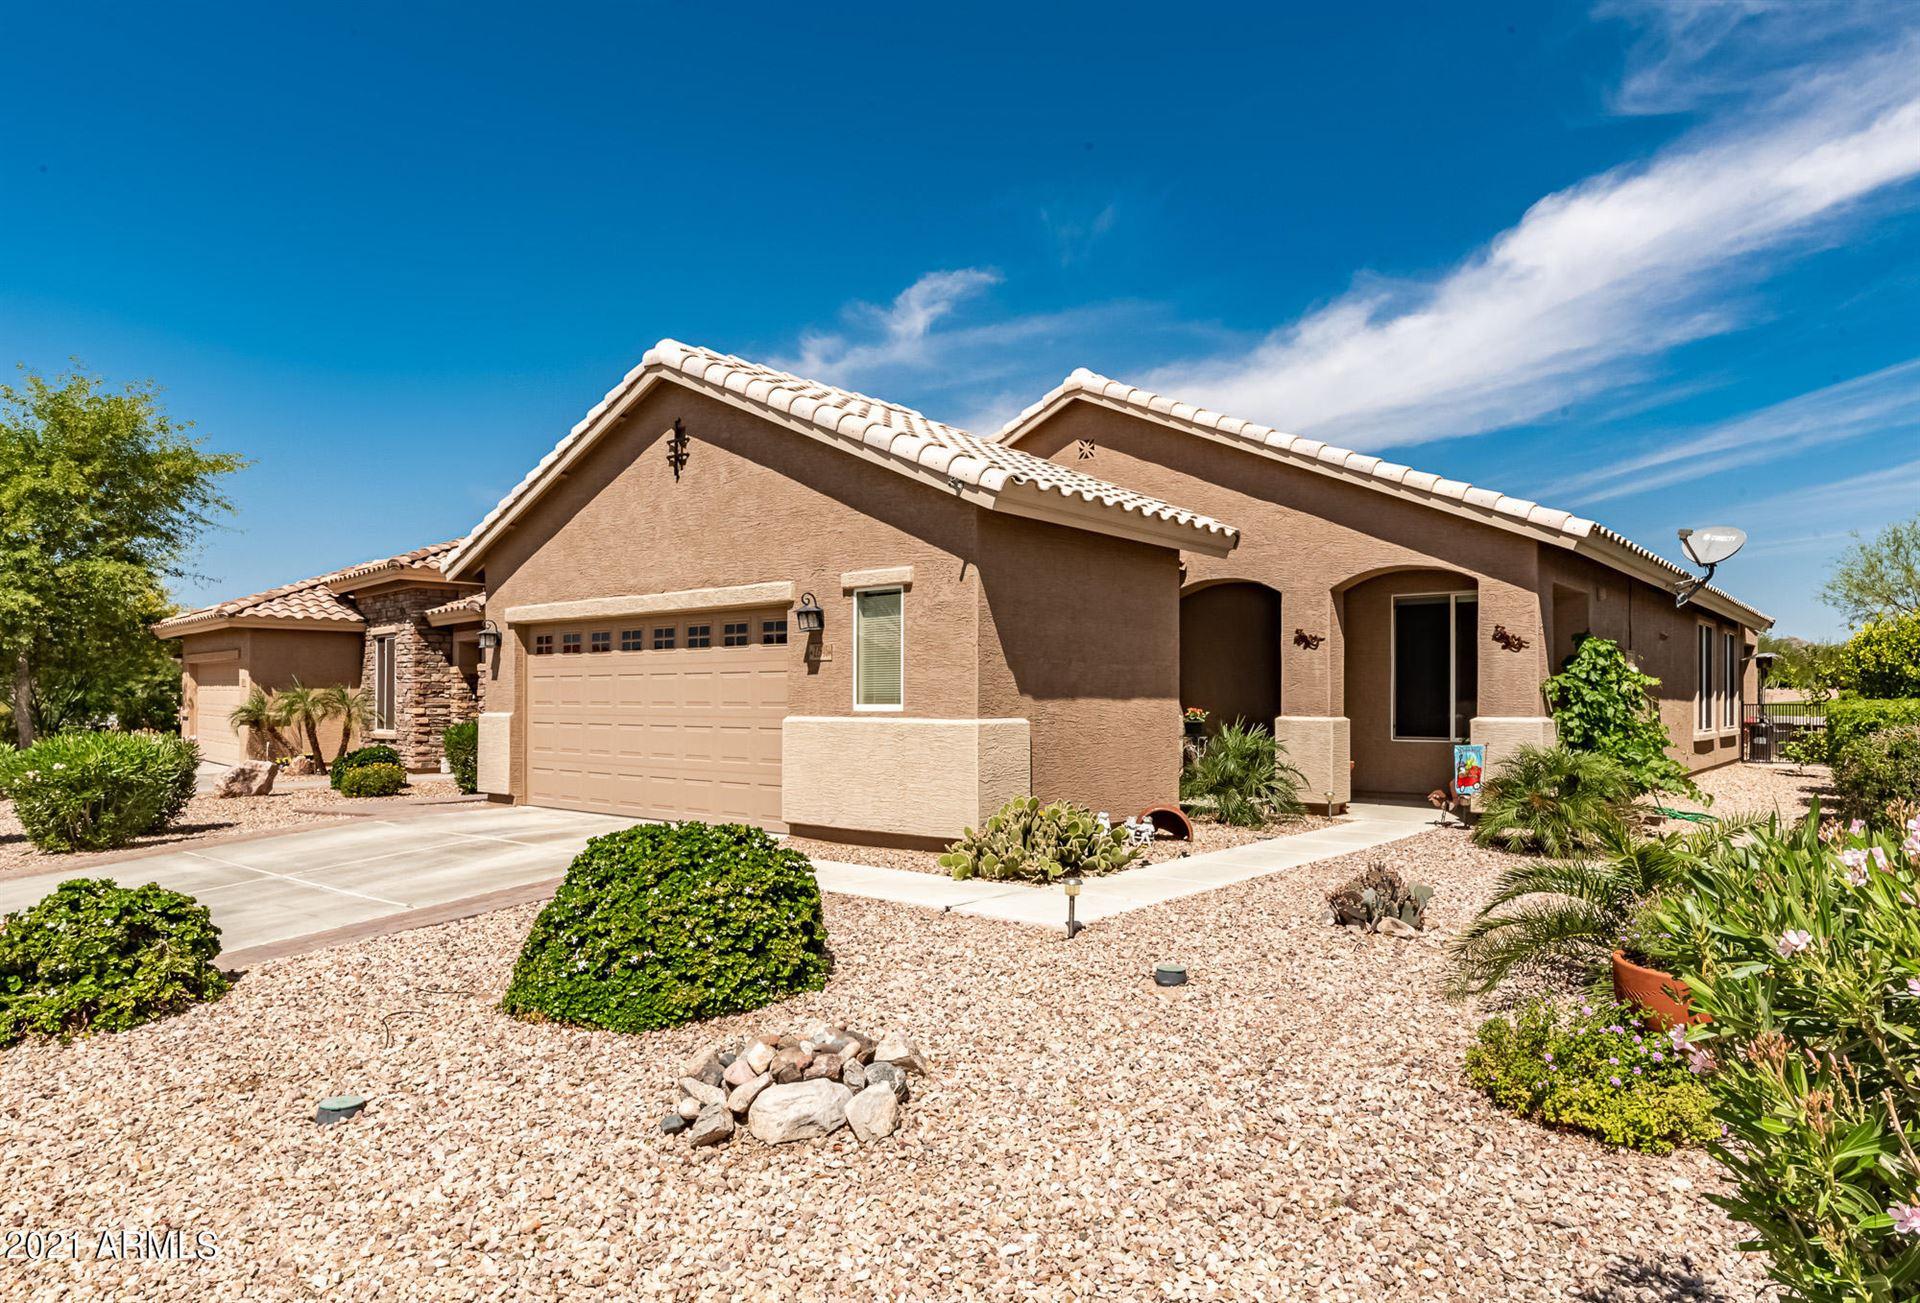 Photo of 22546 W ANTELOPE Trail, Buckeye, AZ 85326 (MLS # 6231808)